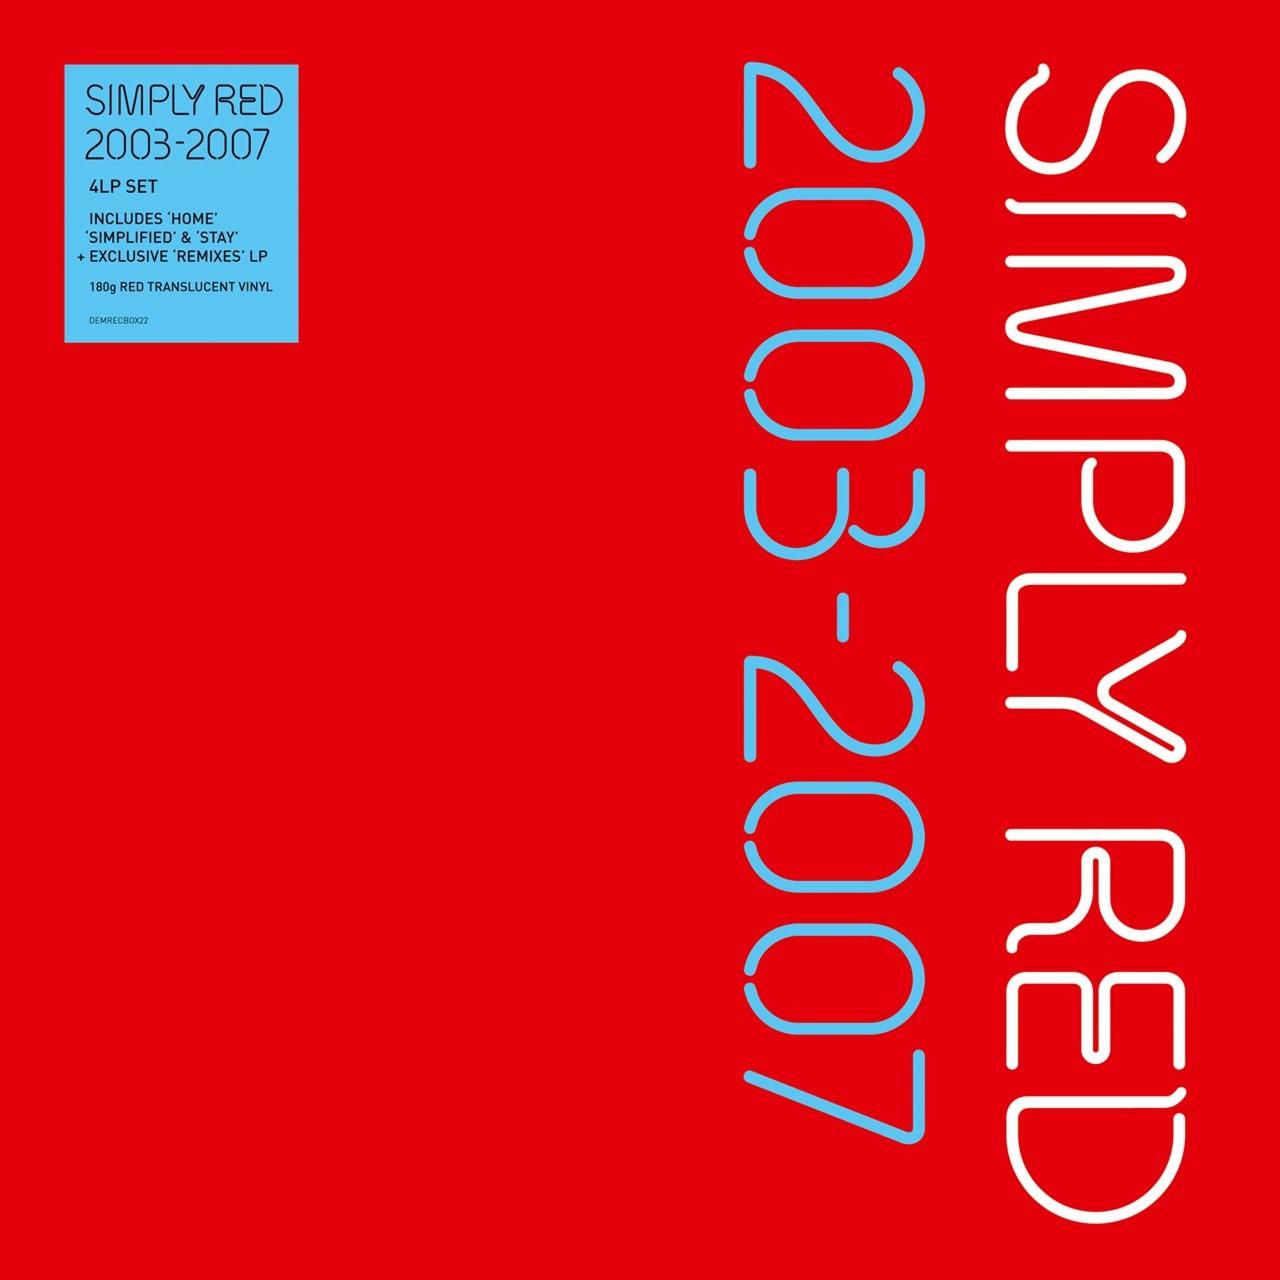 2003-2007 - 1